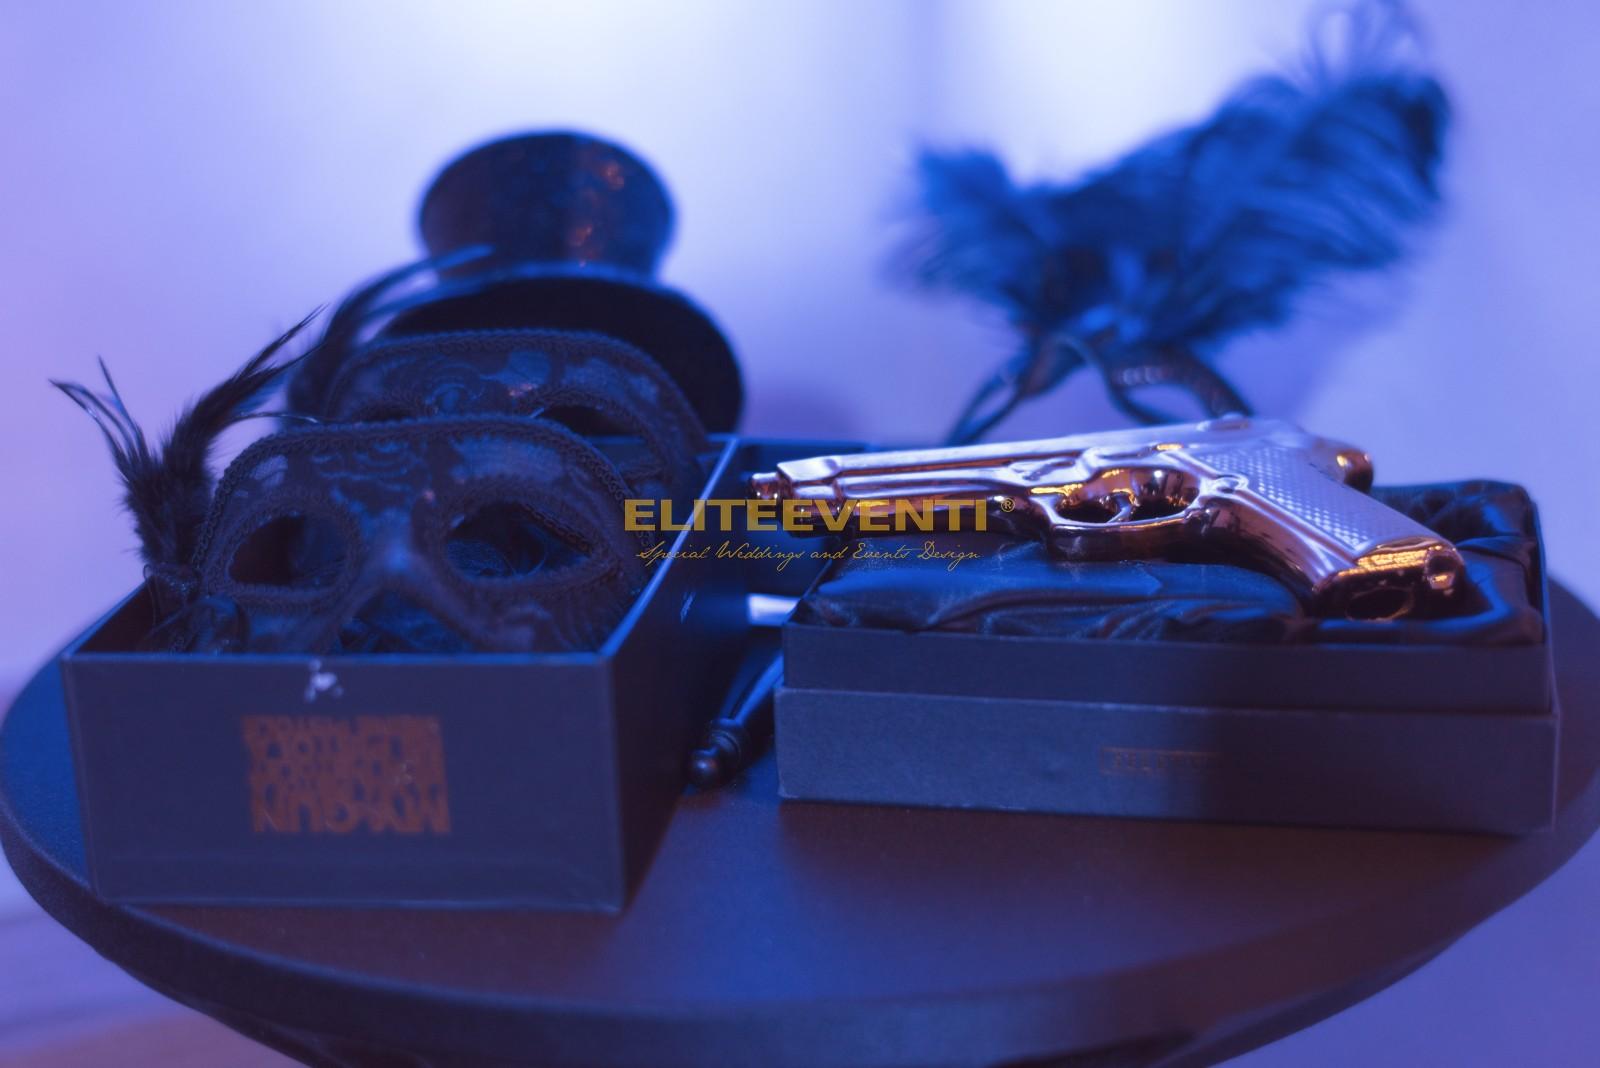 James Bond Party by Eliteeventi